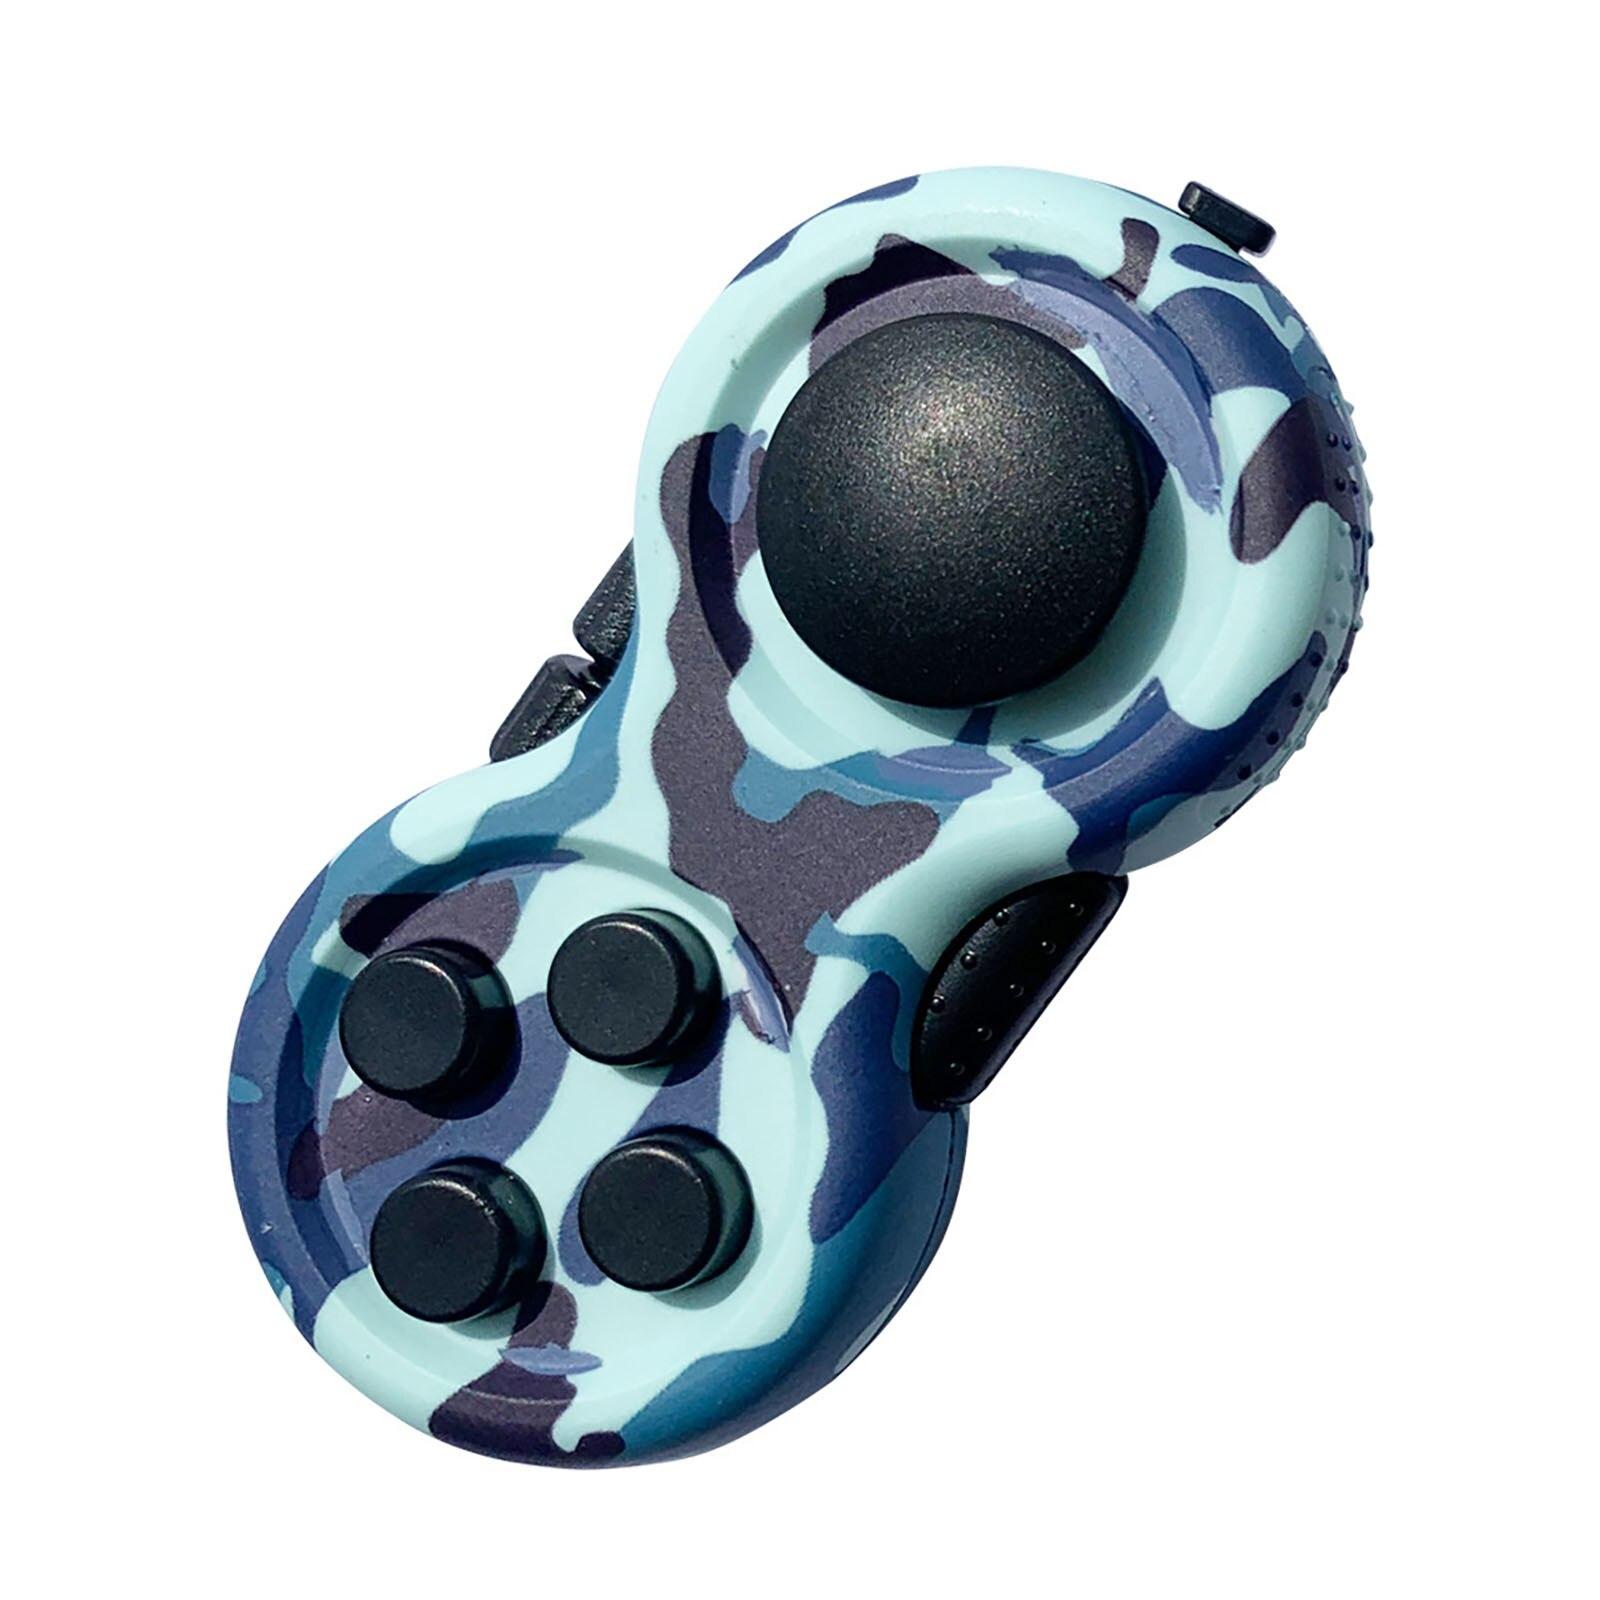 fidget pad handle controller type 2 fidget toy 8695 - Wacky Track